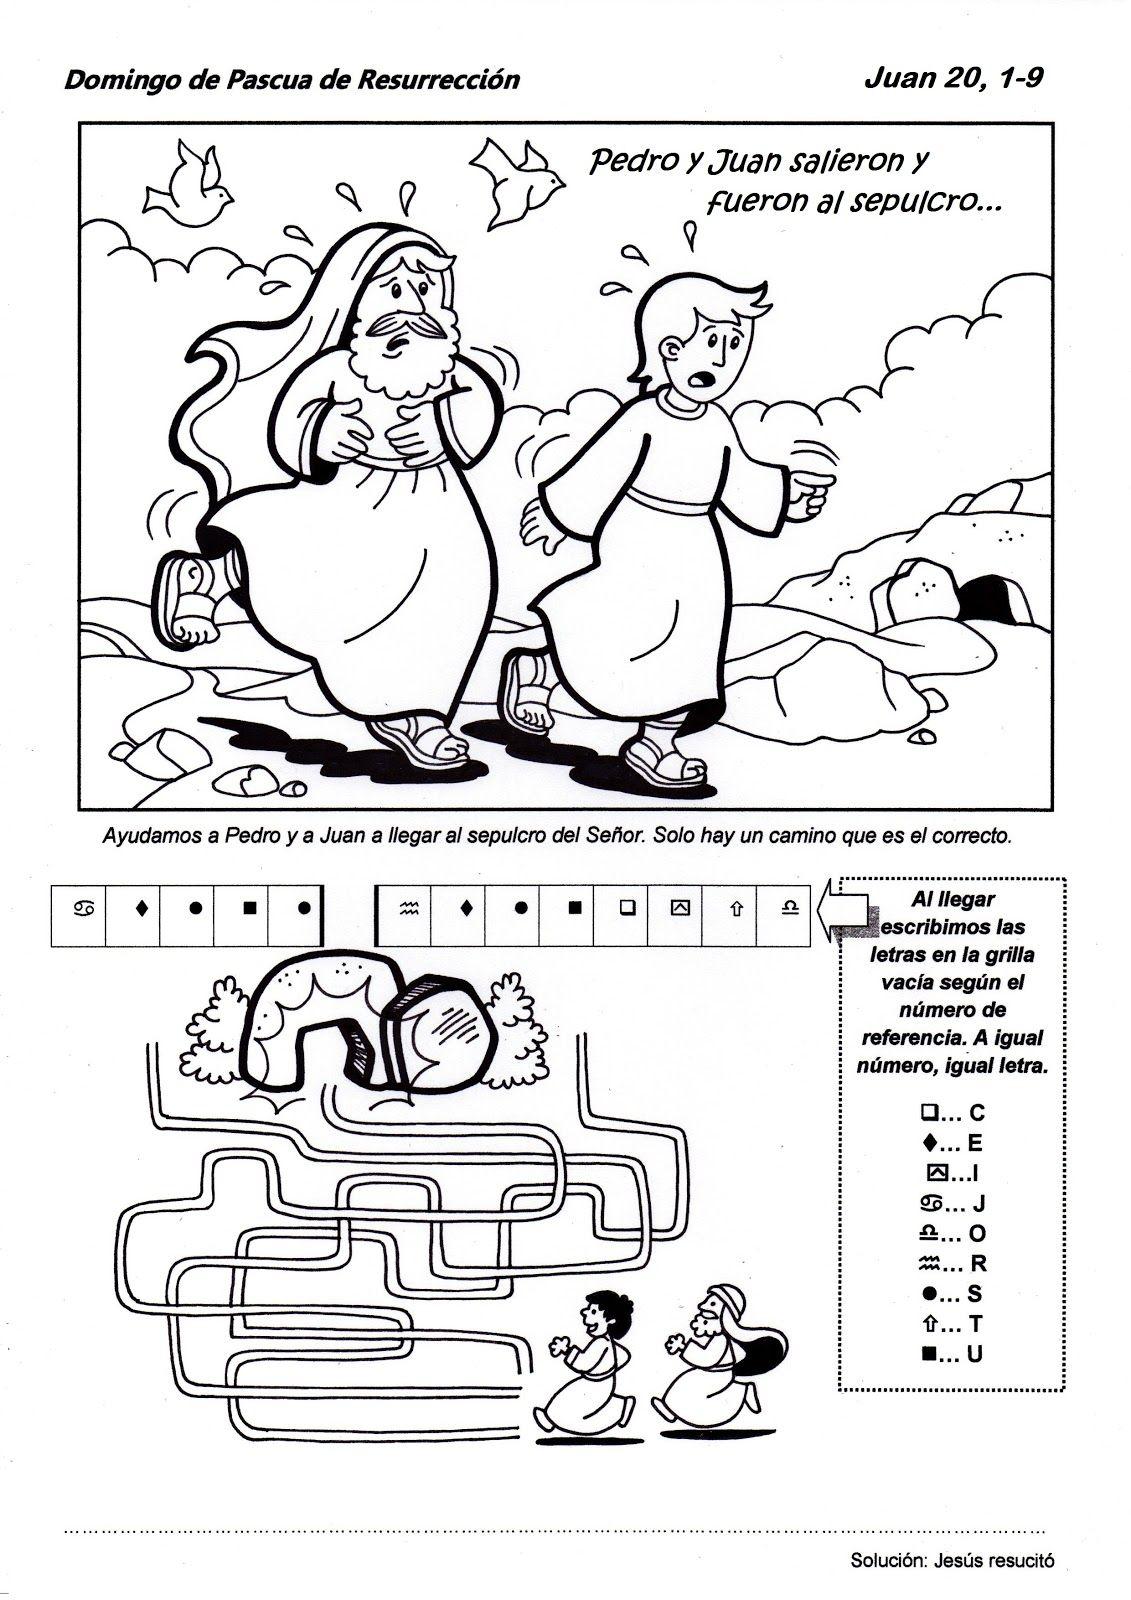 SGBlogosfera. Amigos de Jesús: DOMINGO DE PASCUA | Actividades de ...